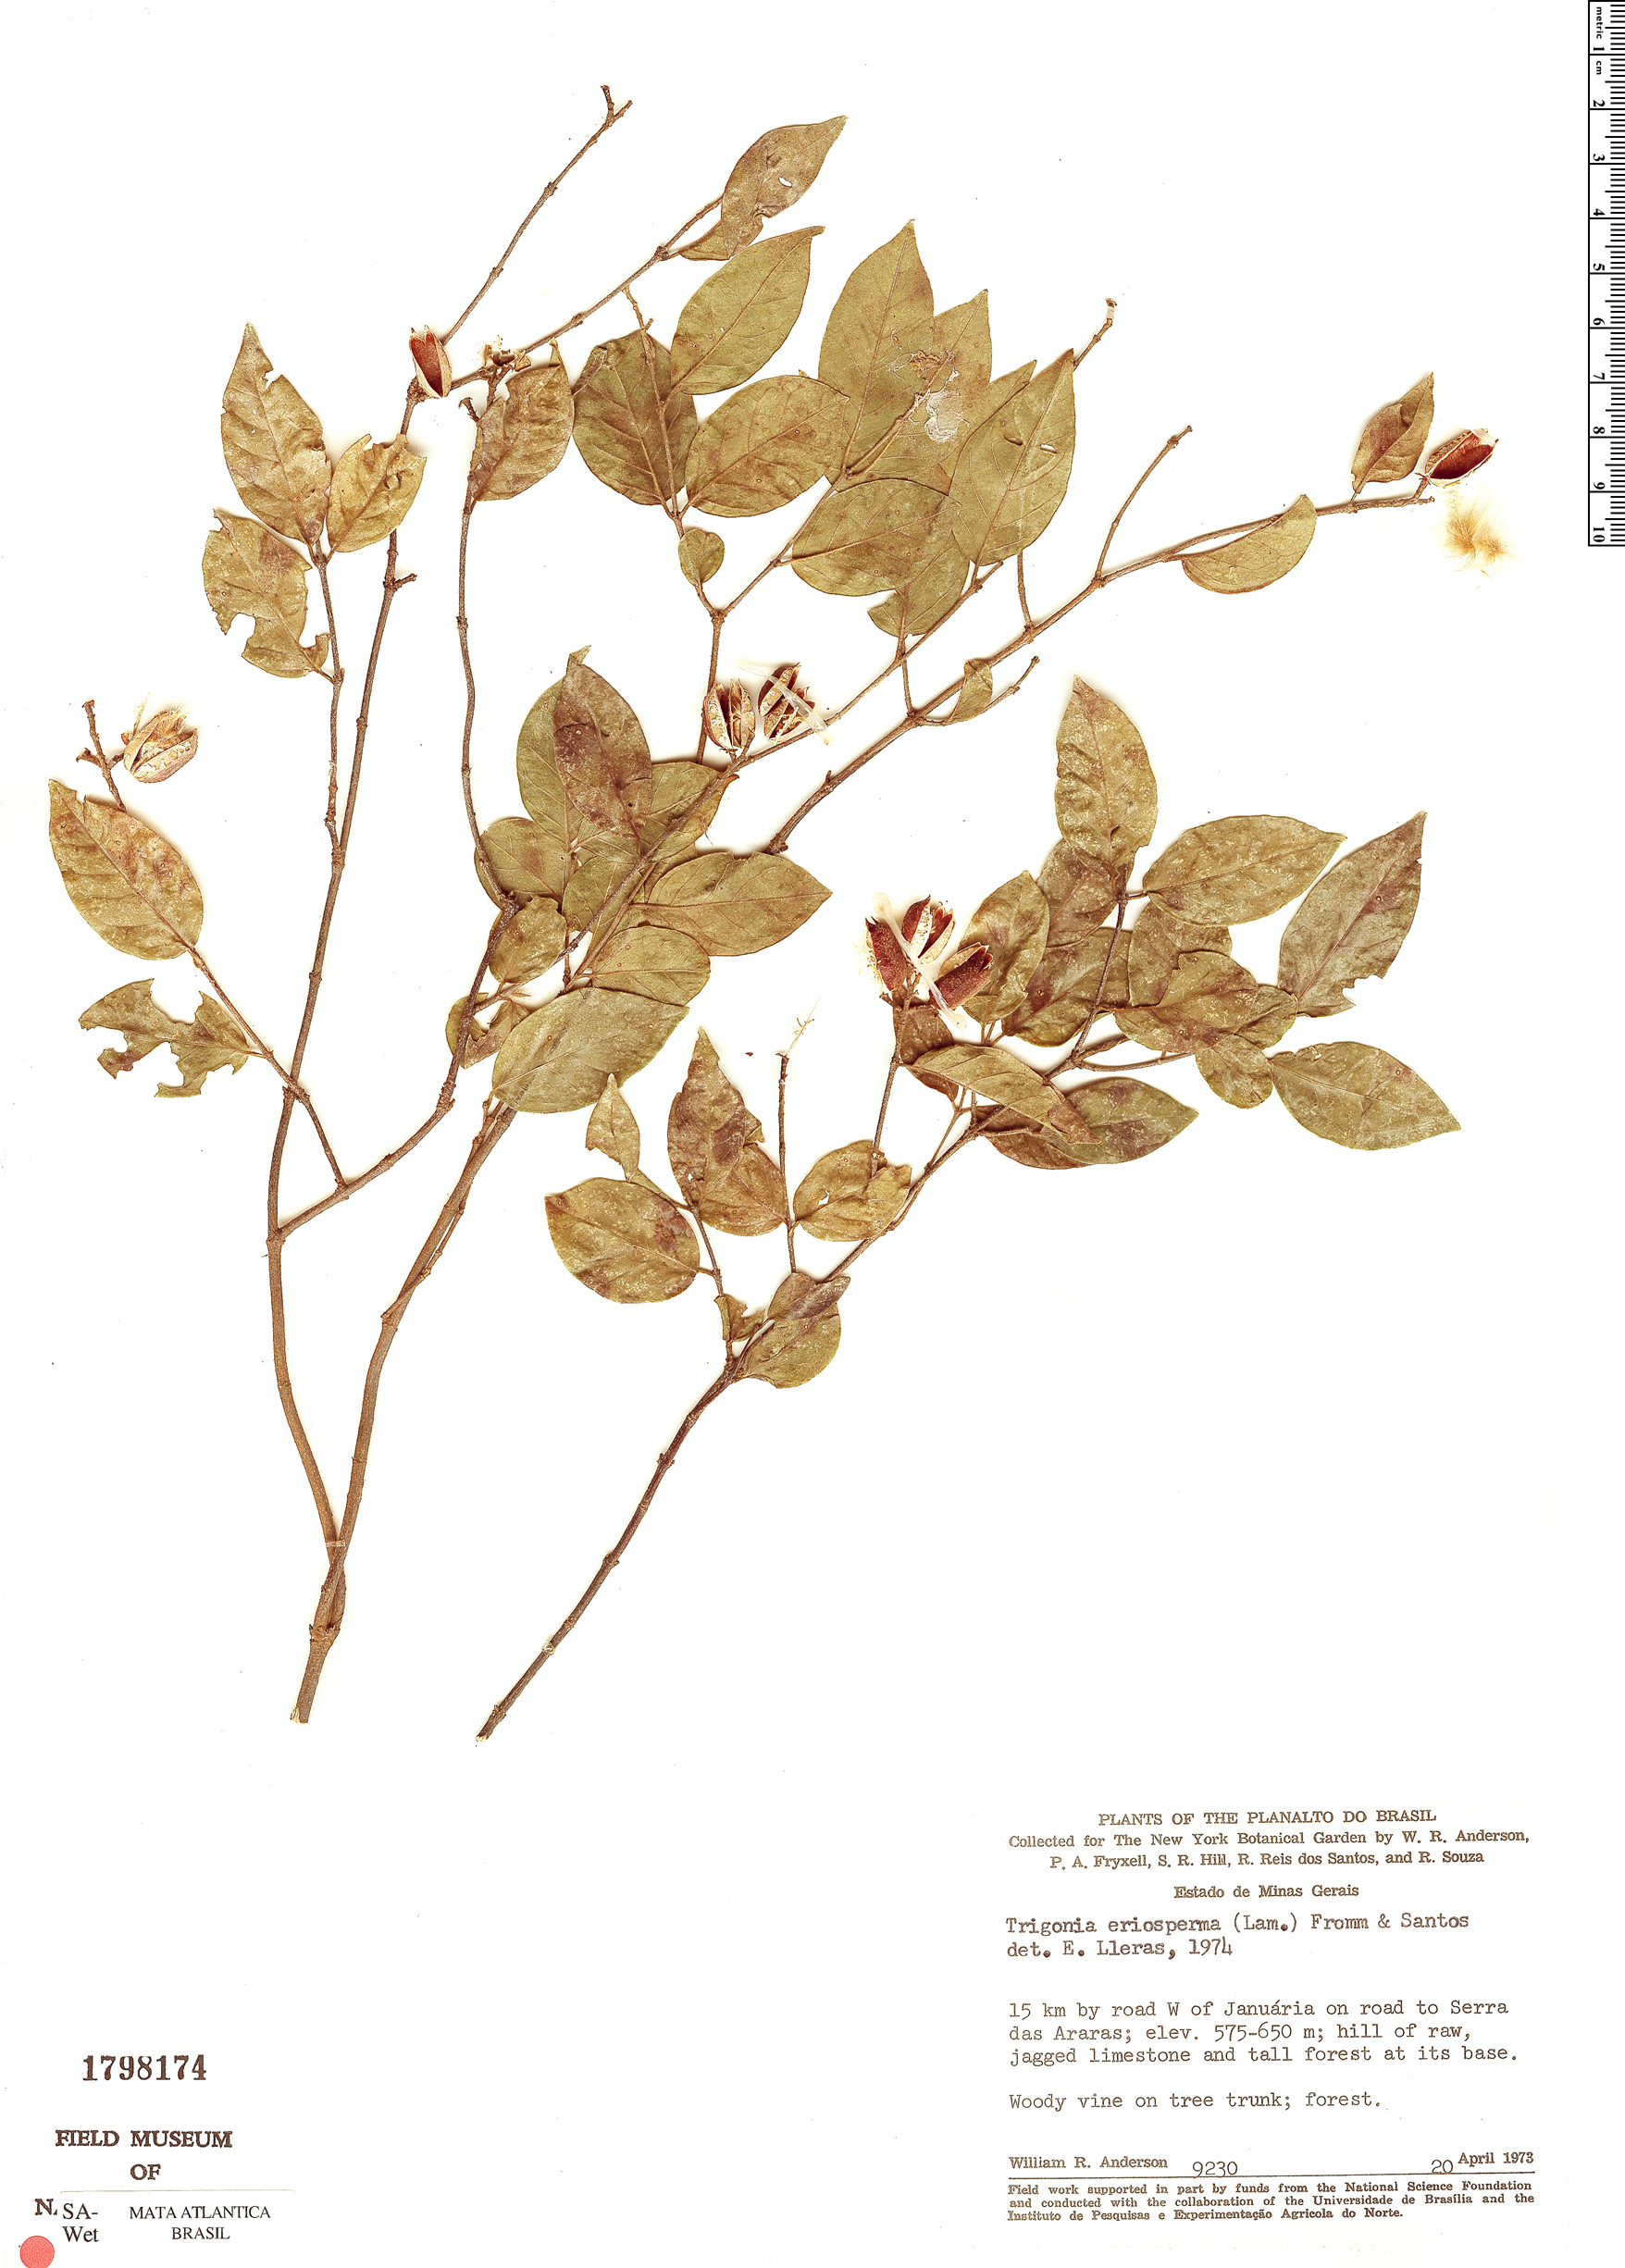 Espécime: Trigonia eriosperma